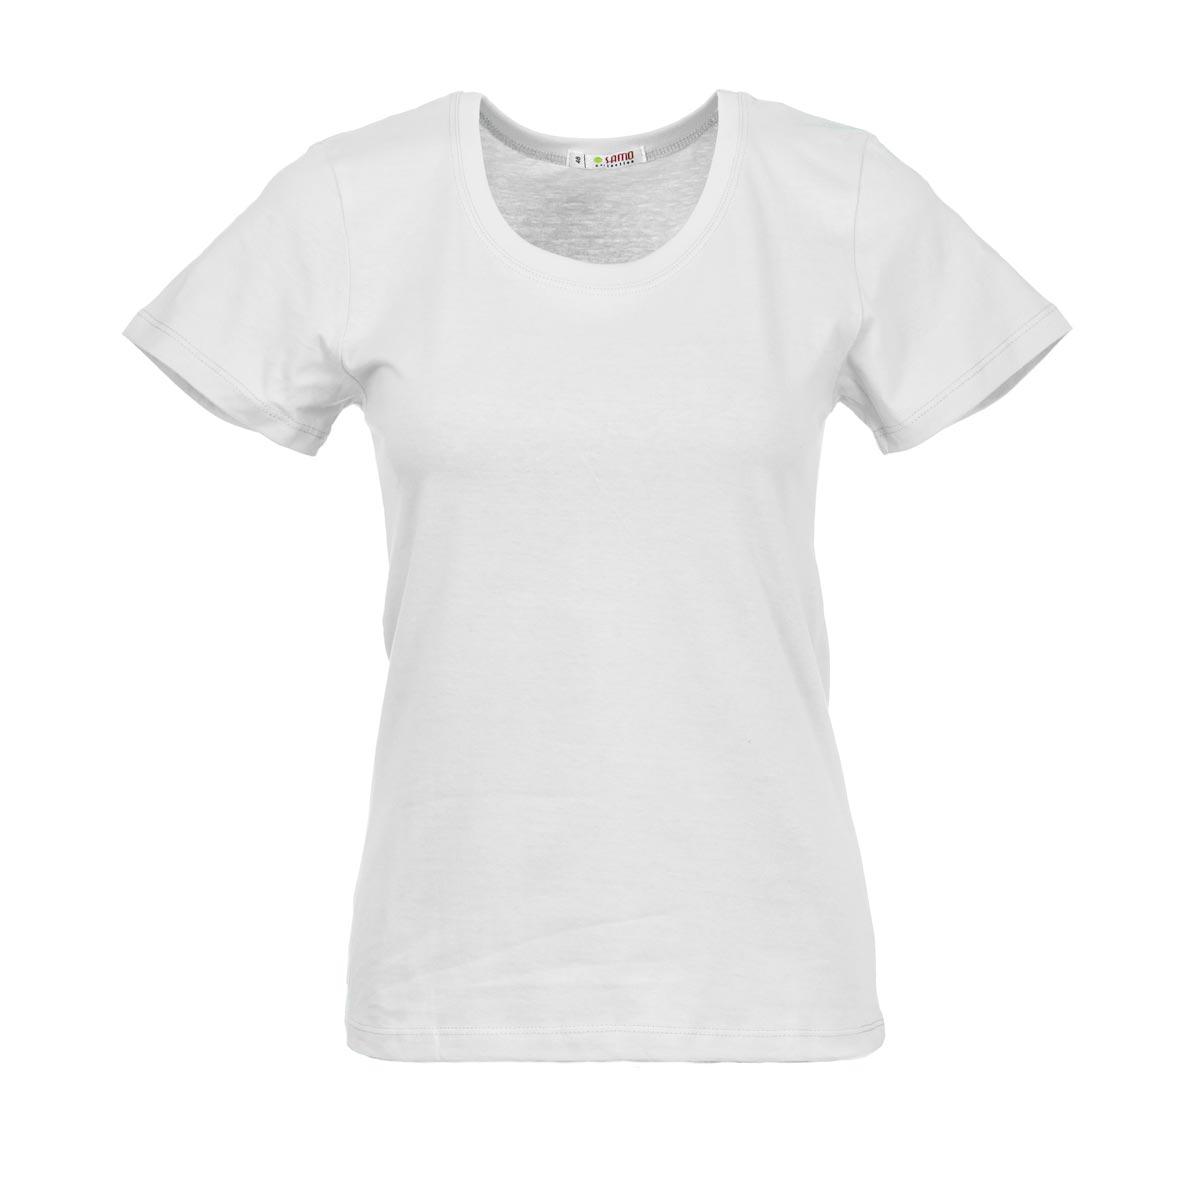 Жен. футболка арт. 04-0045 Белый р. 50Майки и футболки<br>Фактический ОГ:84 см<br>Фактический ОТ:82 см<br>Фактический ОБ:94 см<br>Длина по спинке:59 см<br>Рост:164-170 см<br><br>Тип: Жен. футболка<br>Размер: 50<br>Материал: Супрем